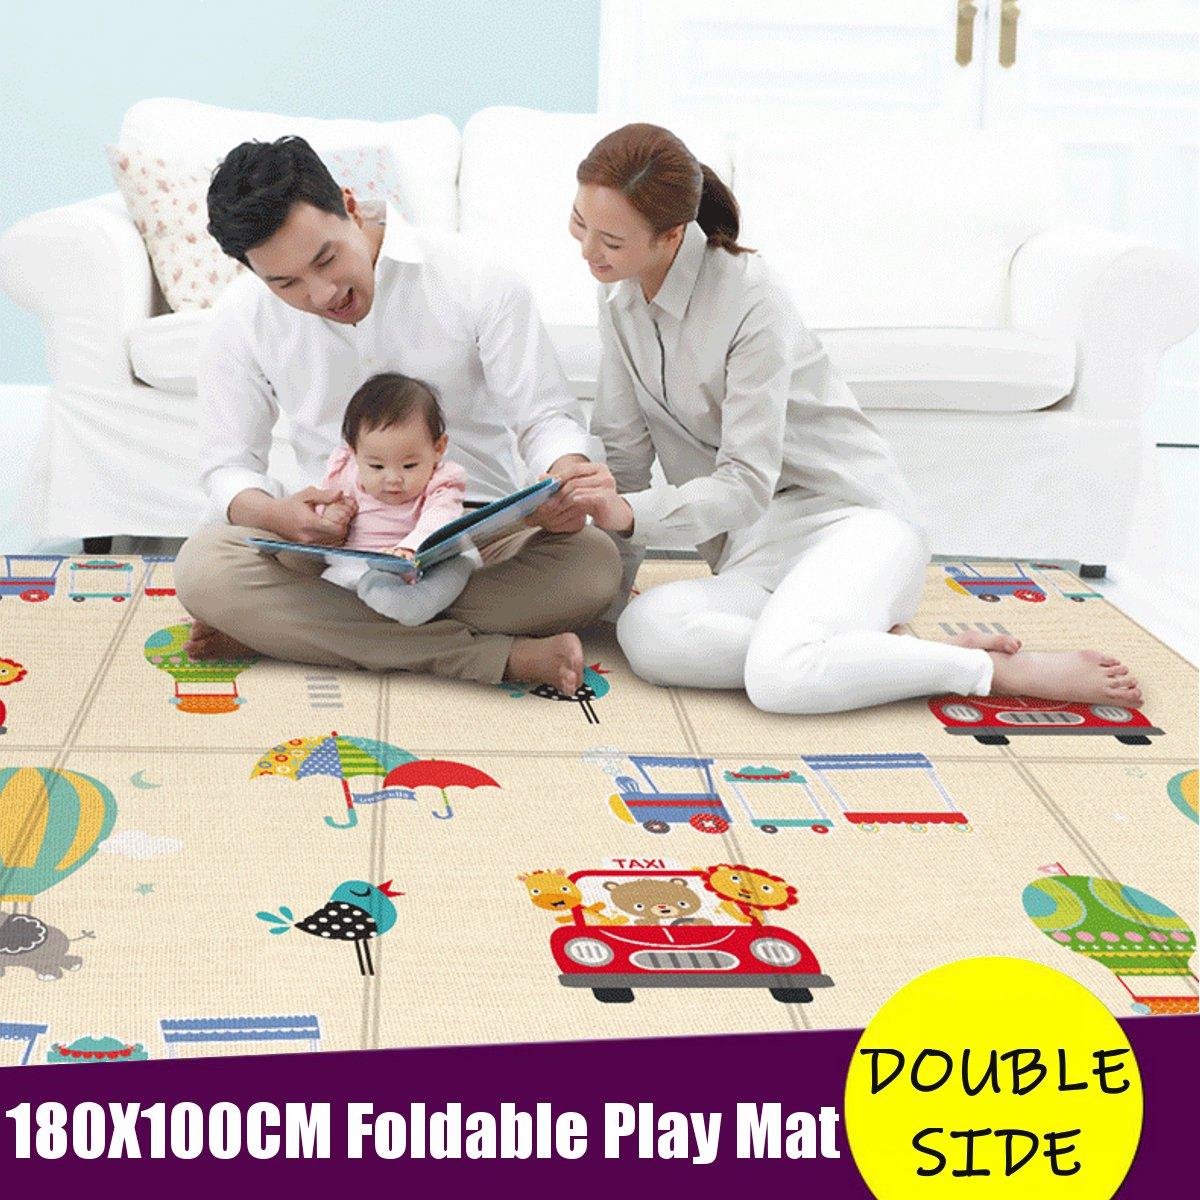 Folding Play Mat Thick Baby Crawling Cover Rug 180x100cm Waterproof Floor Carpet Climbing Pad Foldable Baby Games Mats Kids Rug